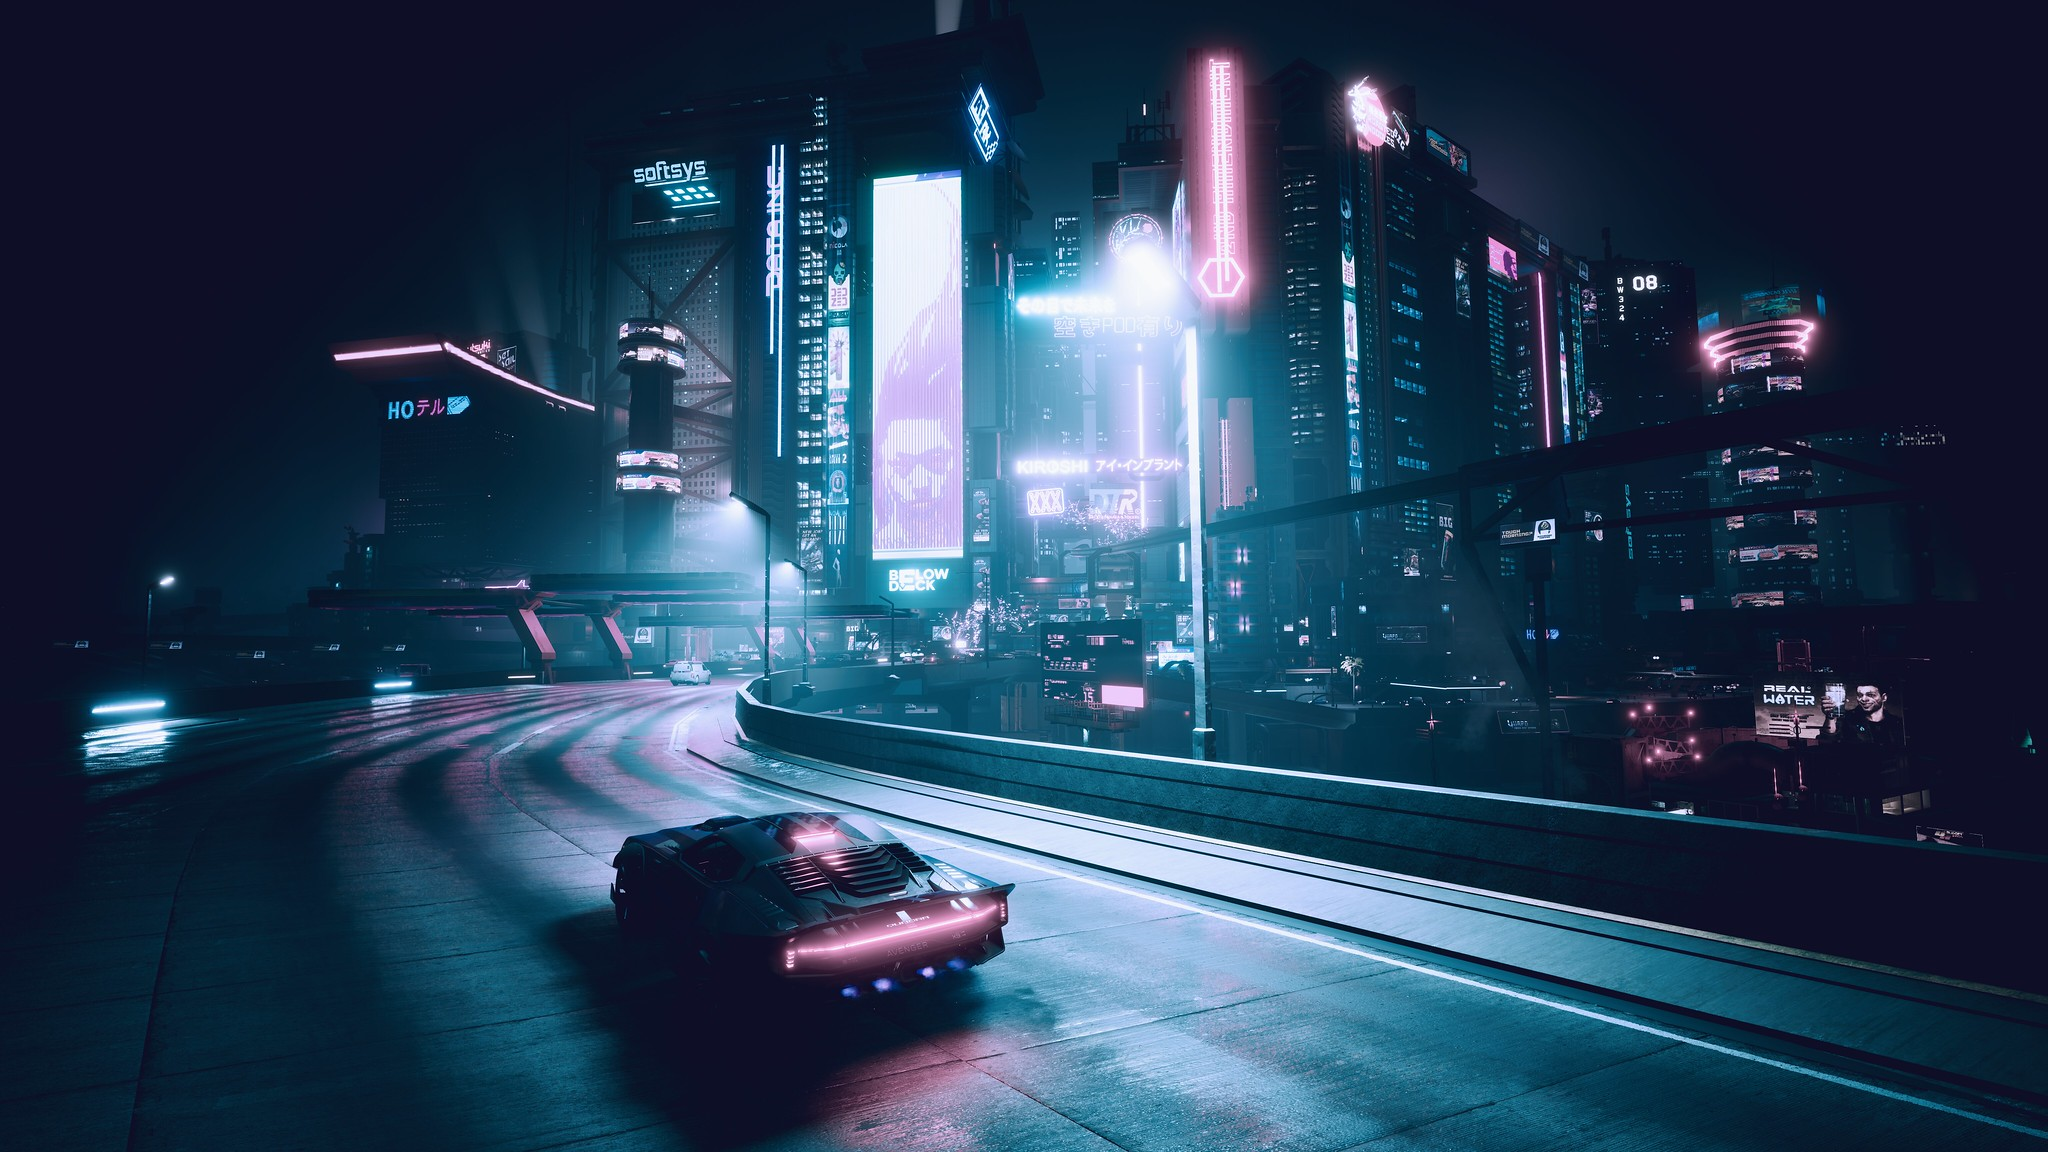 Let a pro help you take amazing Cyberpunk 2077 screenshots